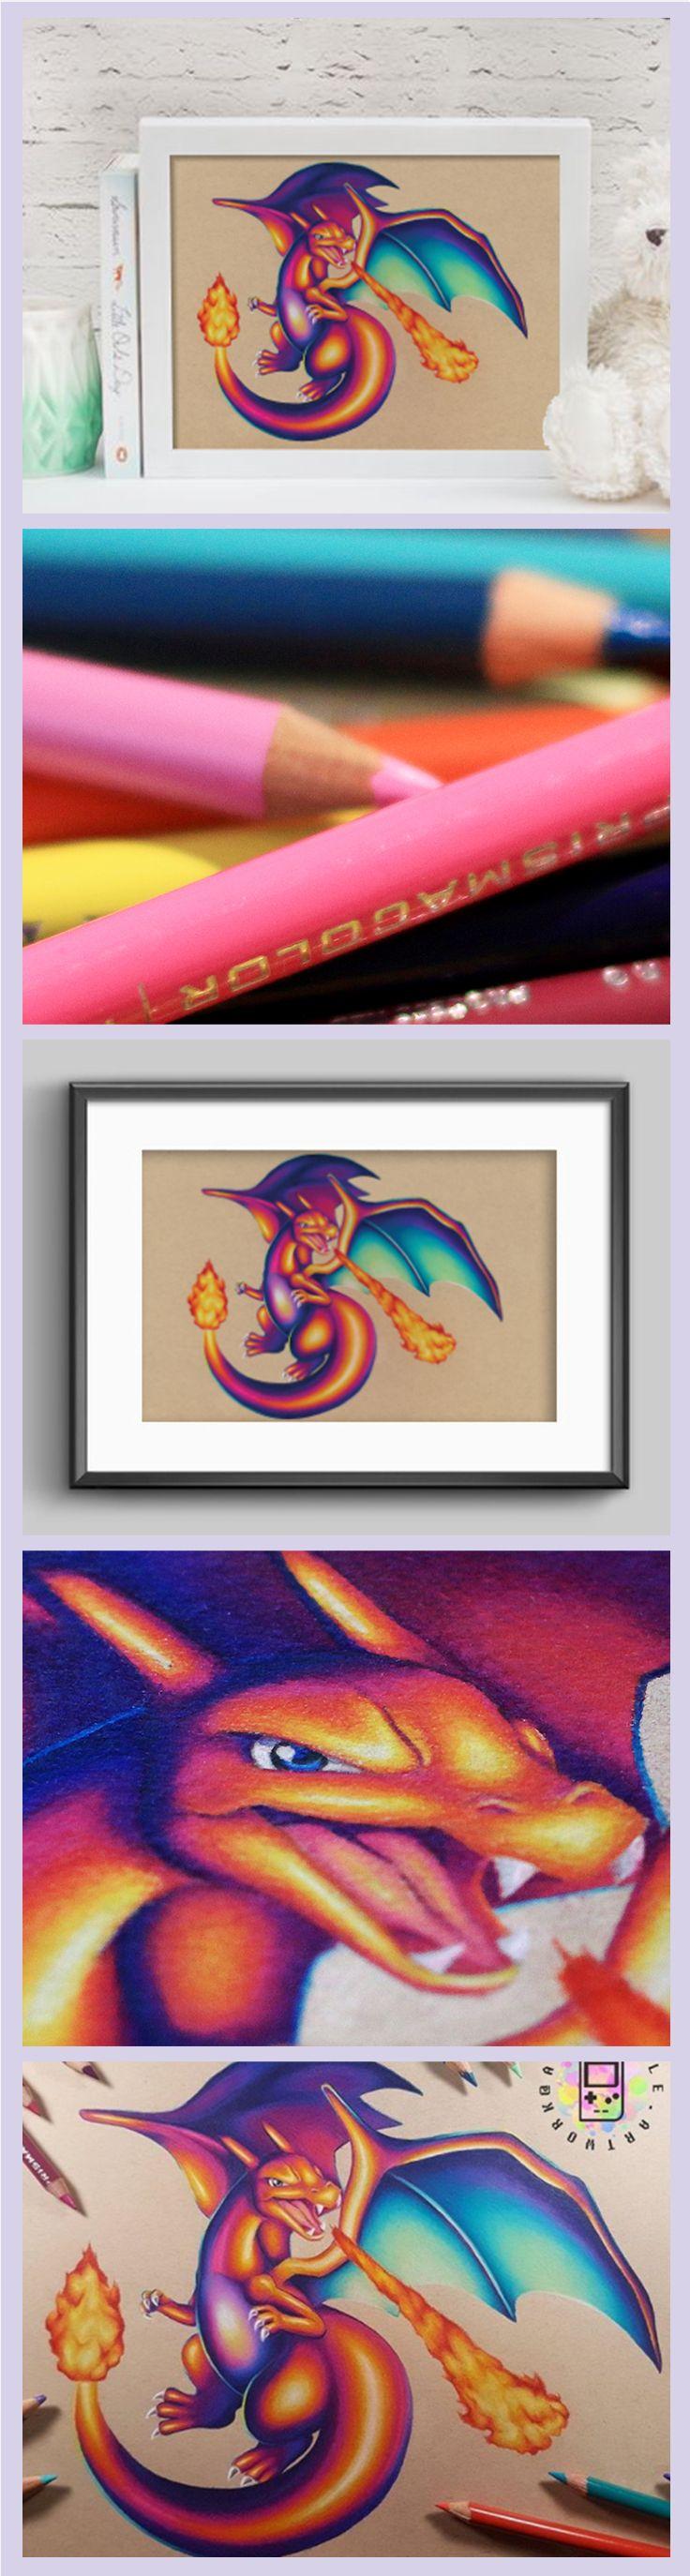 awesome Charizard Art Amazing Geek Art and Geek Decor